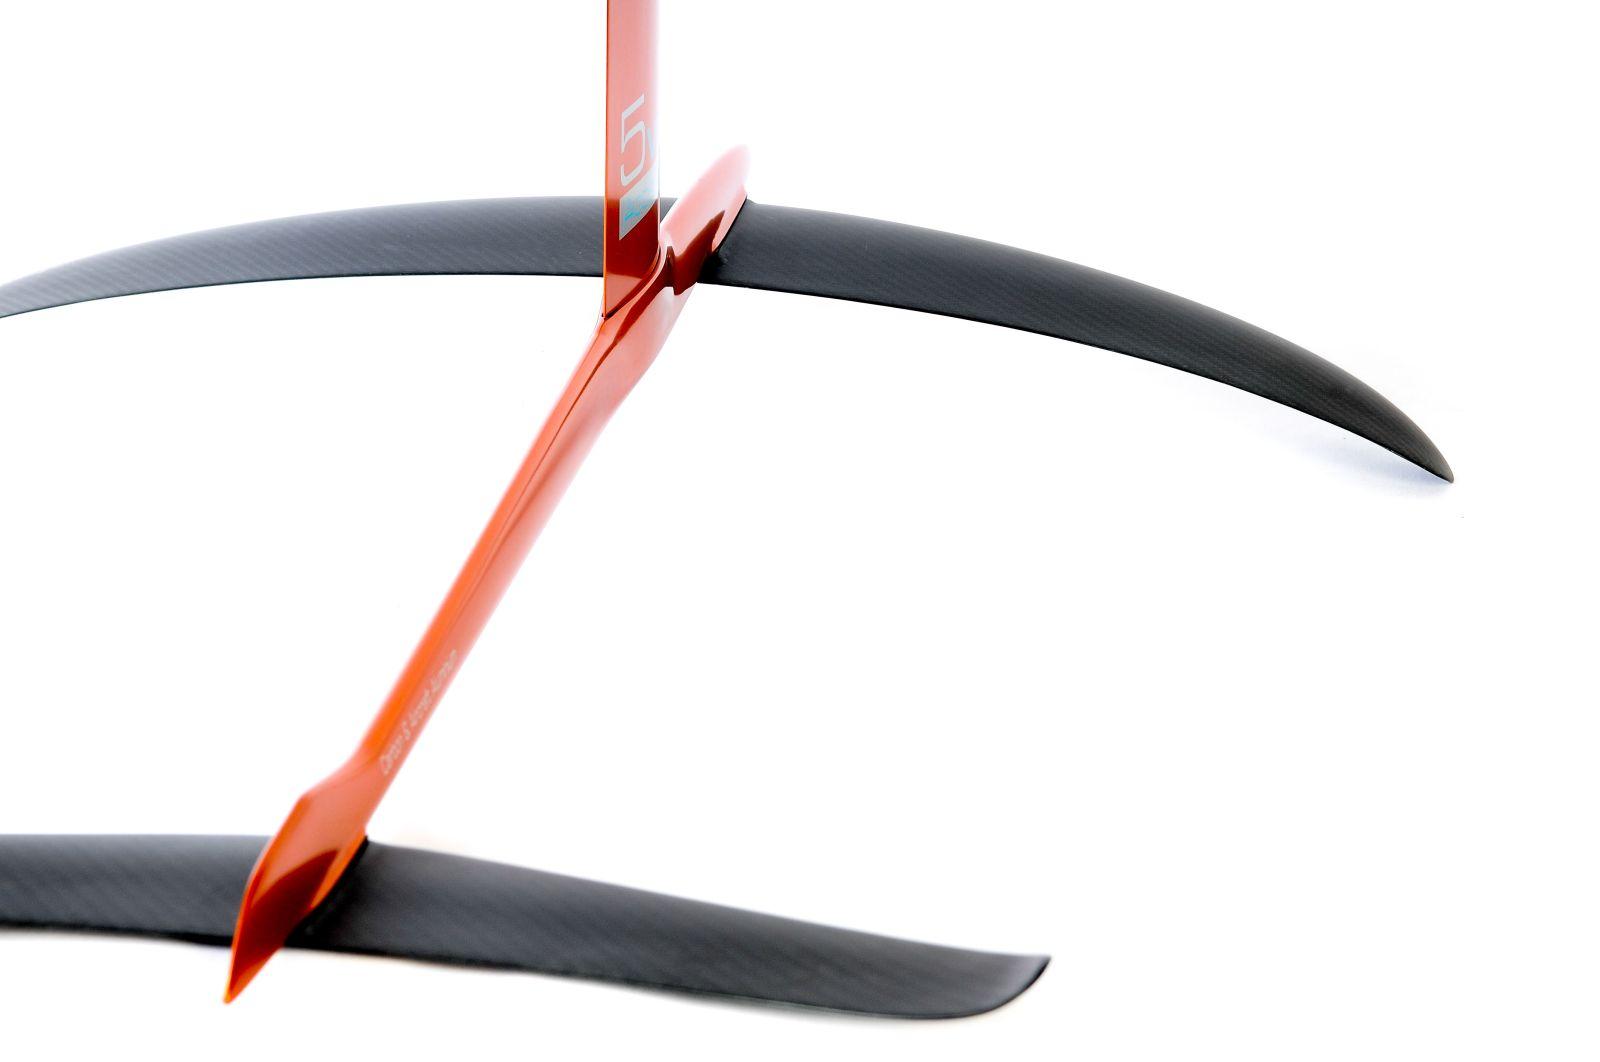 Kitefoil carbon aluminium alpinefoil 5 0 access v2 2771 1